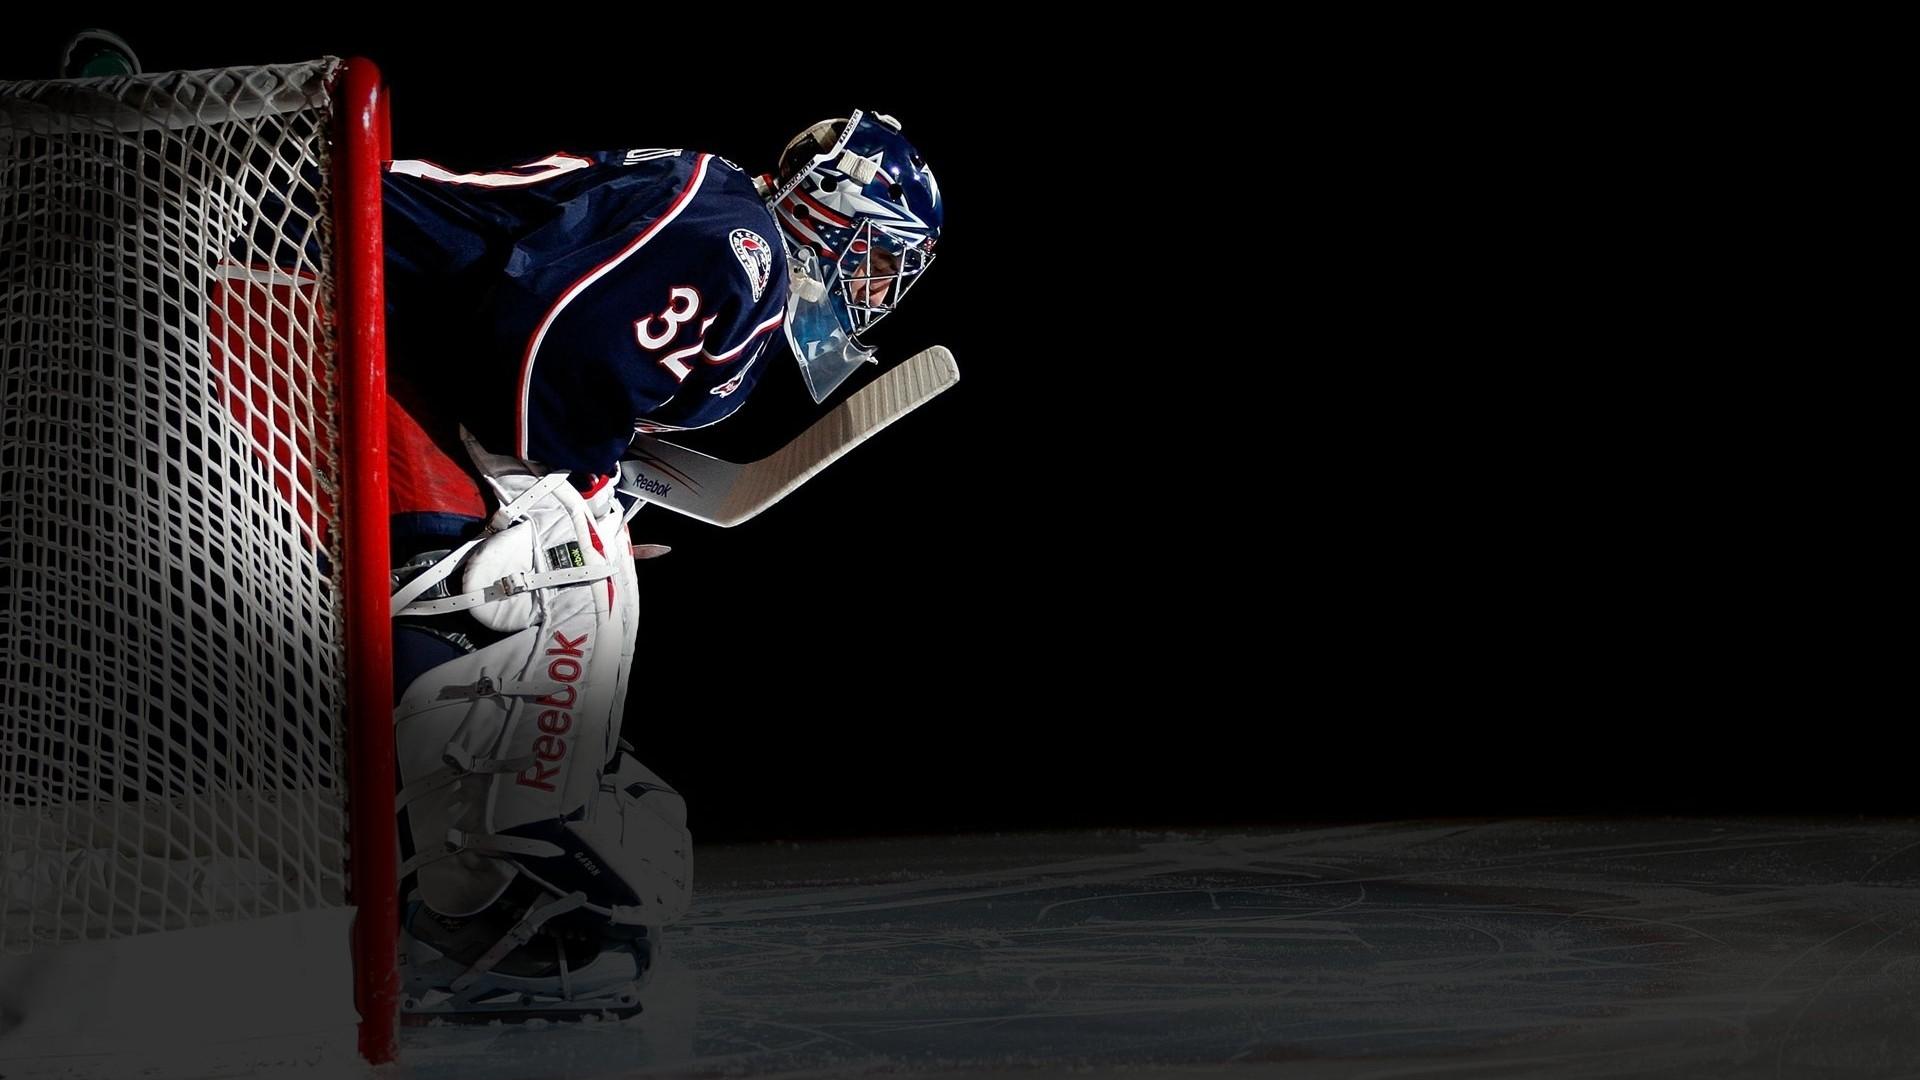 Hockey hd wallpaper download